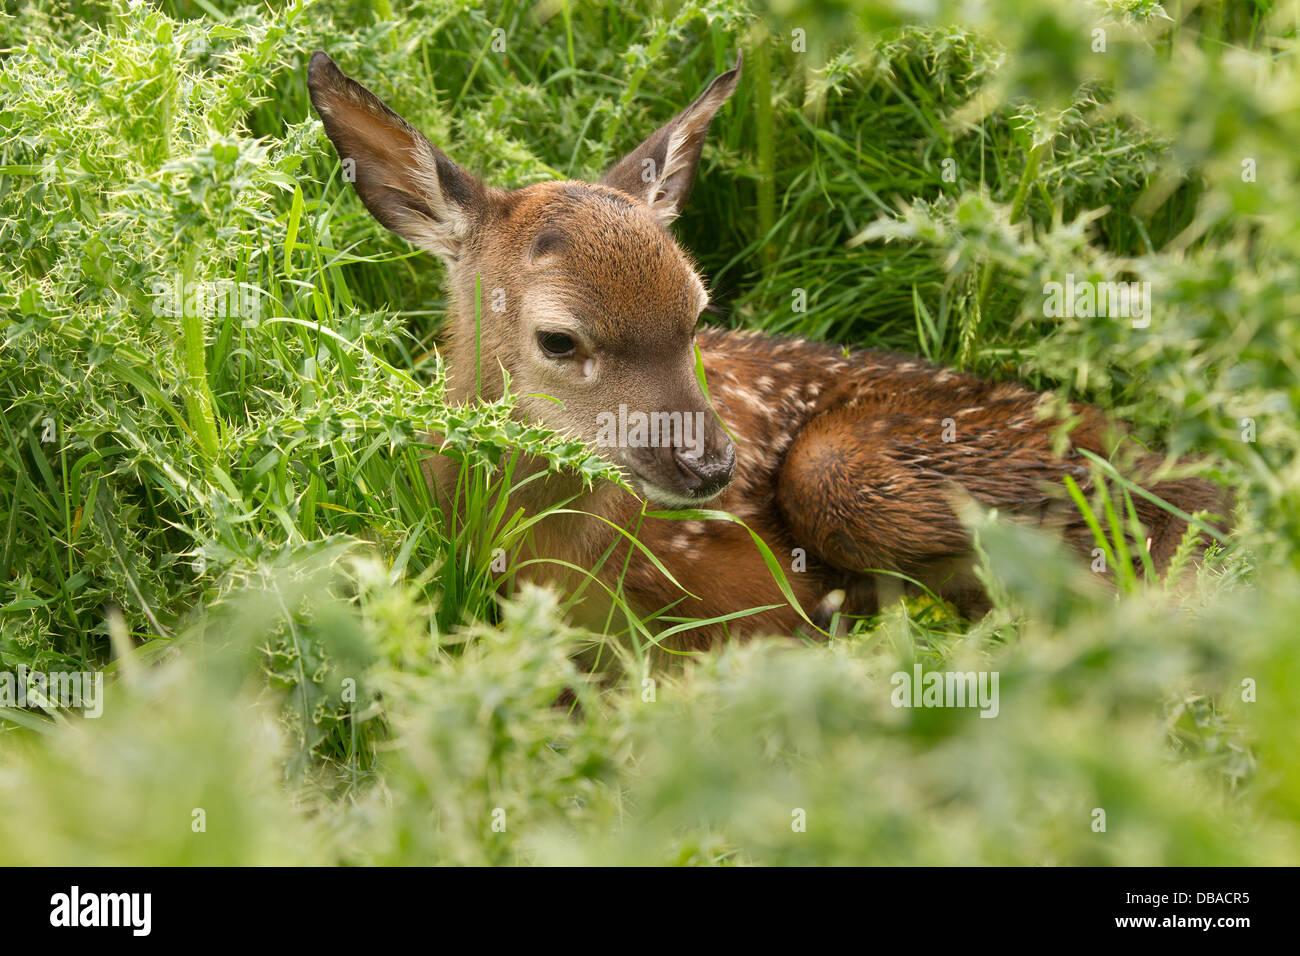 Young red deer, cervus elaphus in thistles - Stock Image